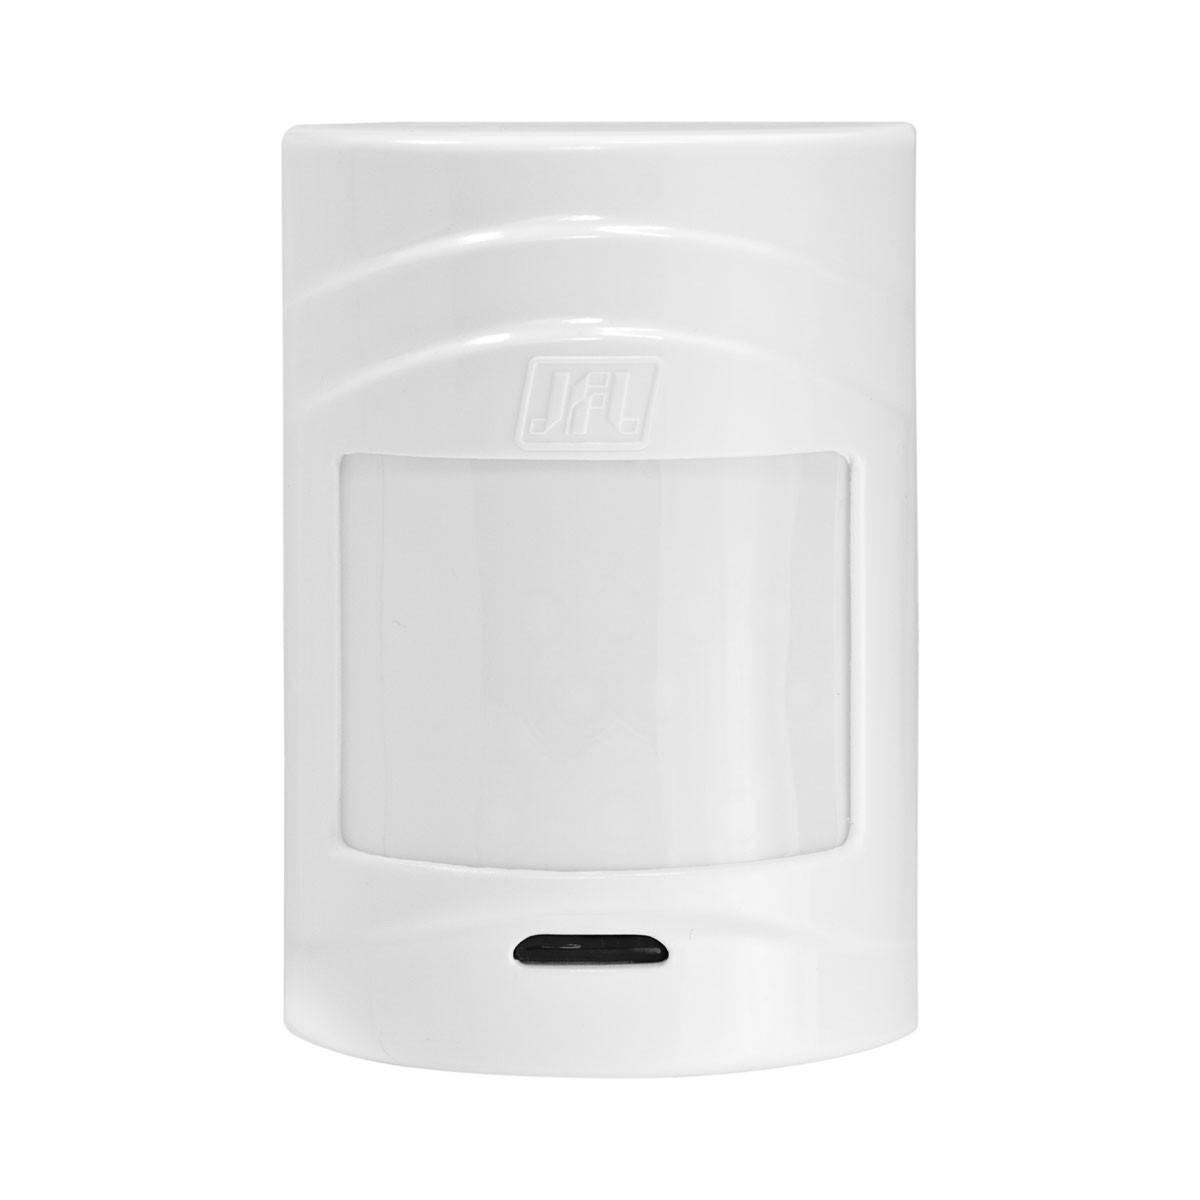 Kit Alarme Jfl Active 20 Ethernet 5 Sensores Sem Fio IrPet 530sf